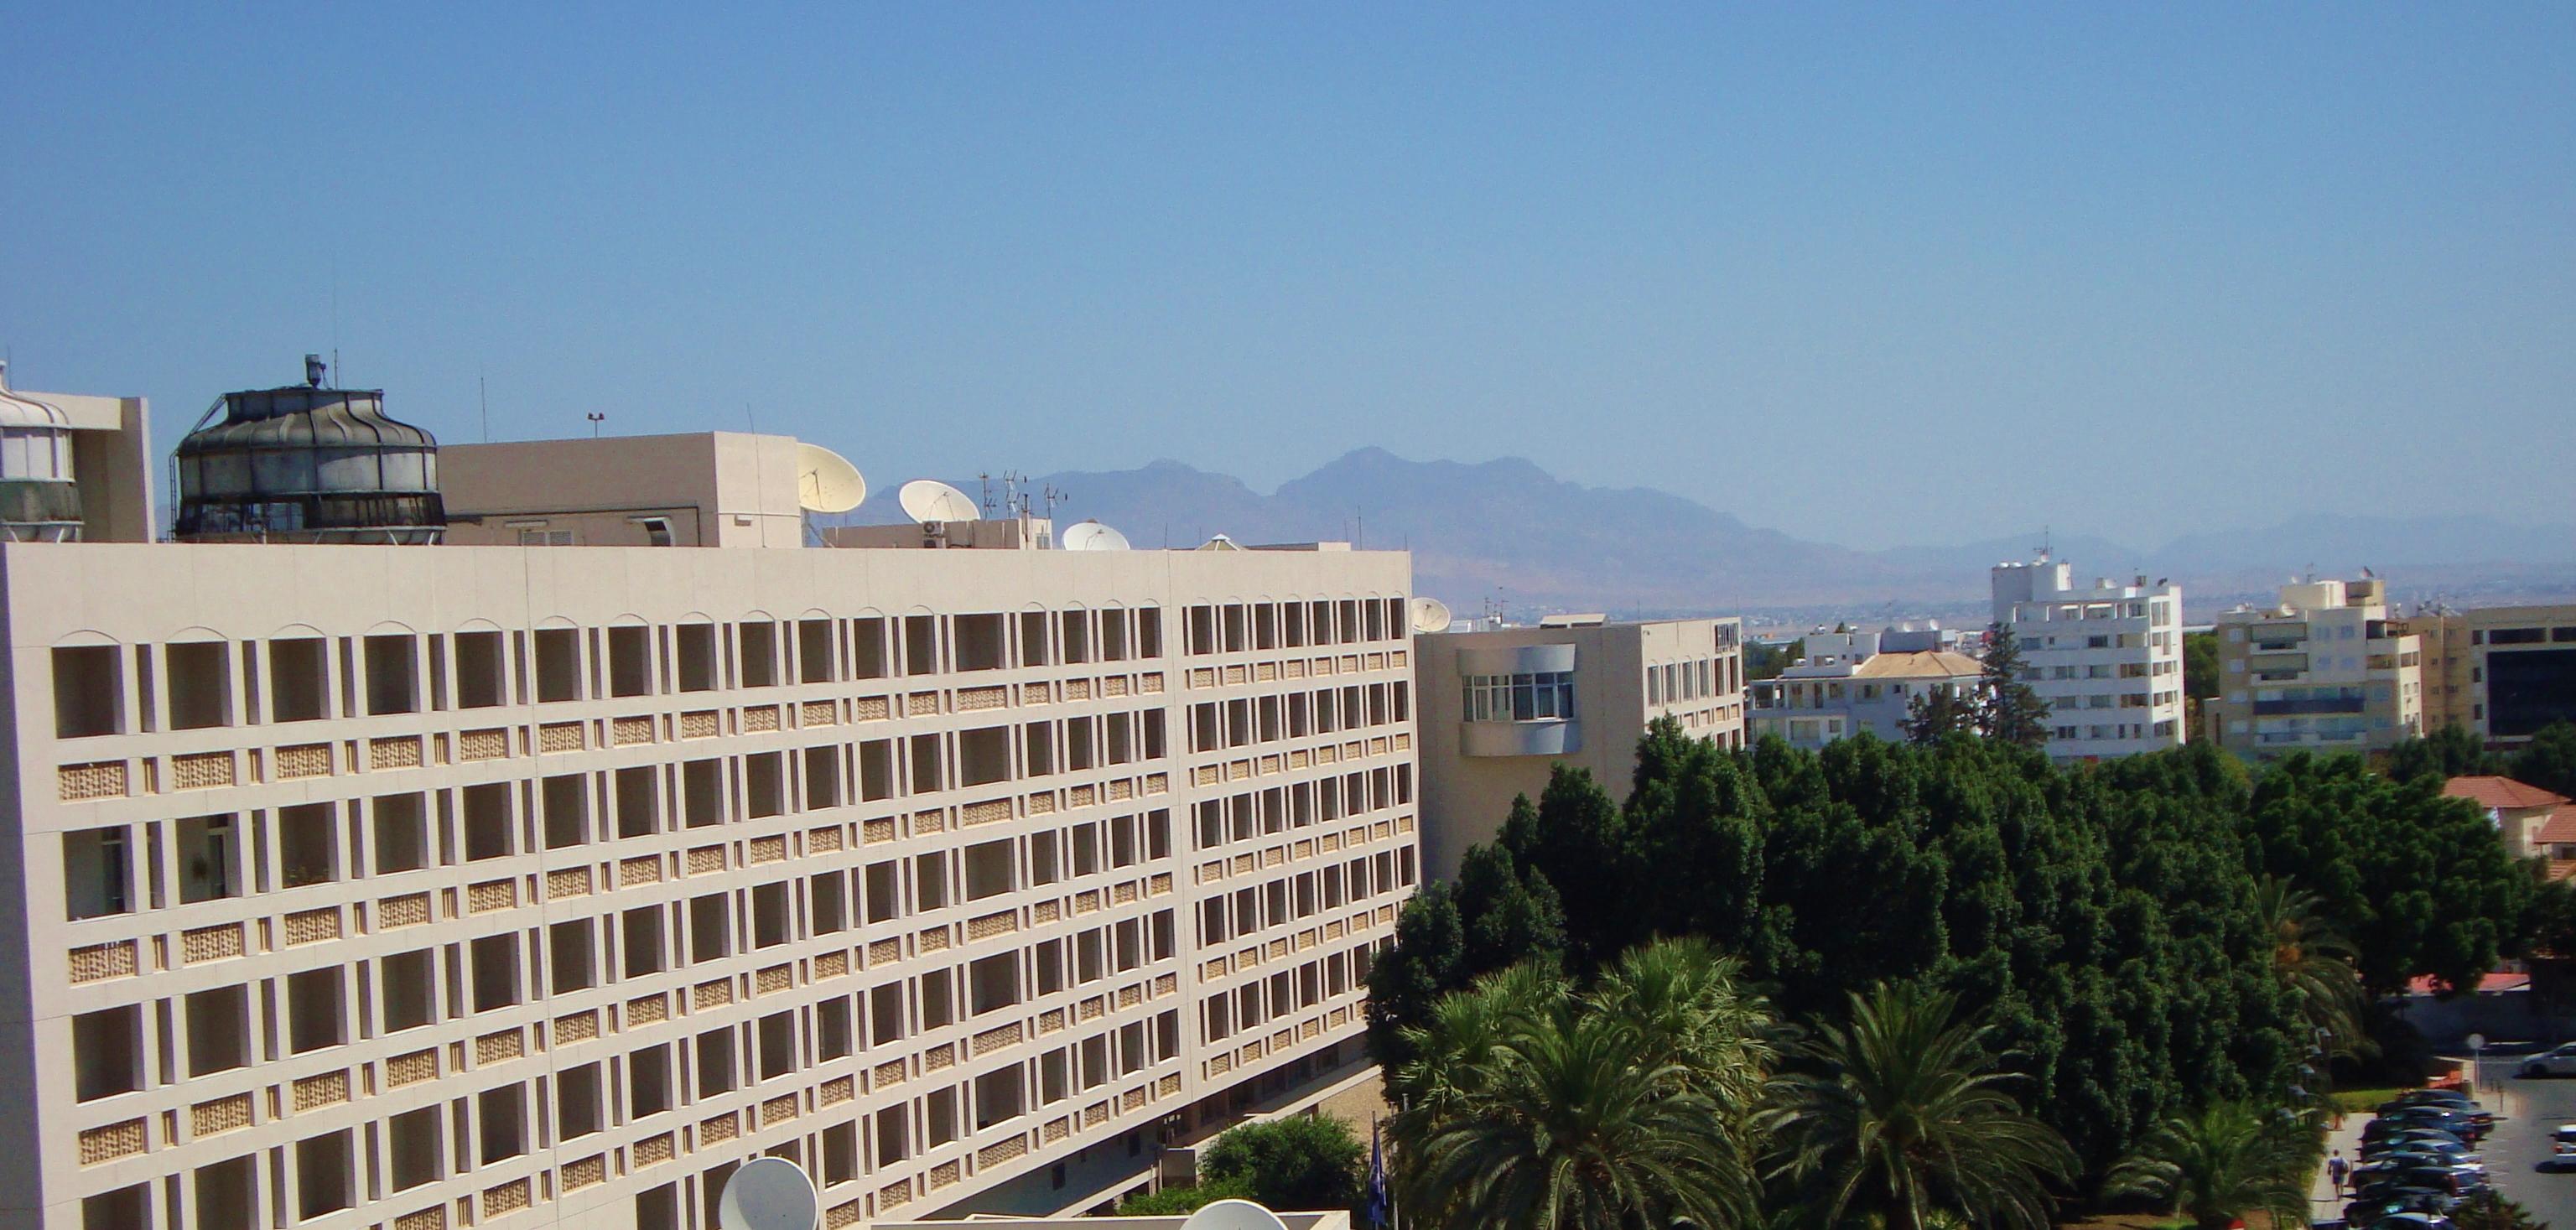 The Capital Hilton Hotel